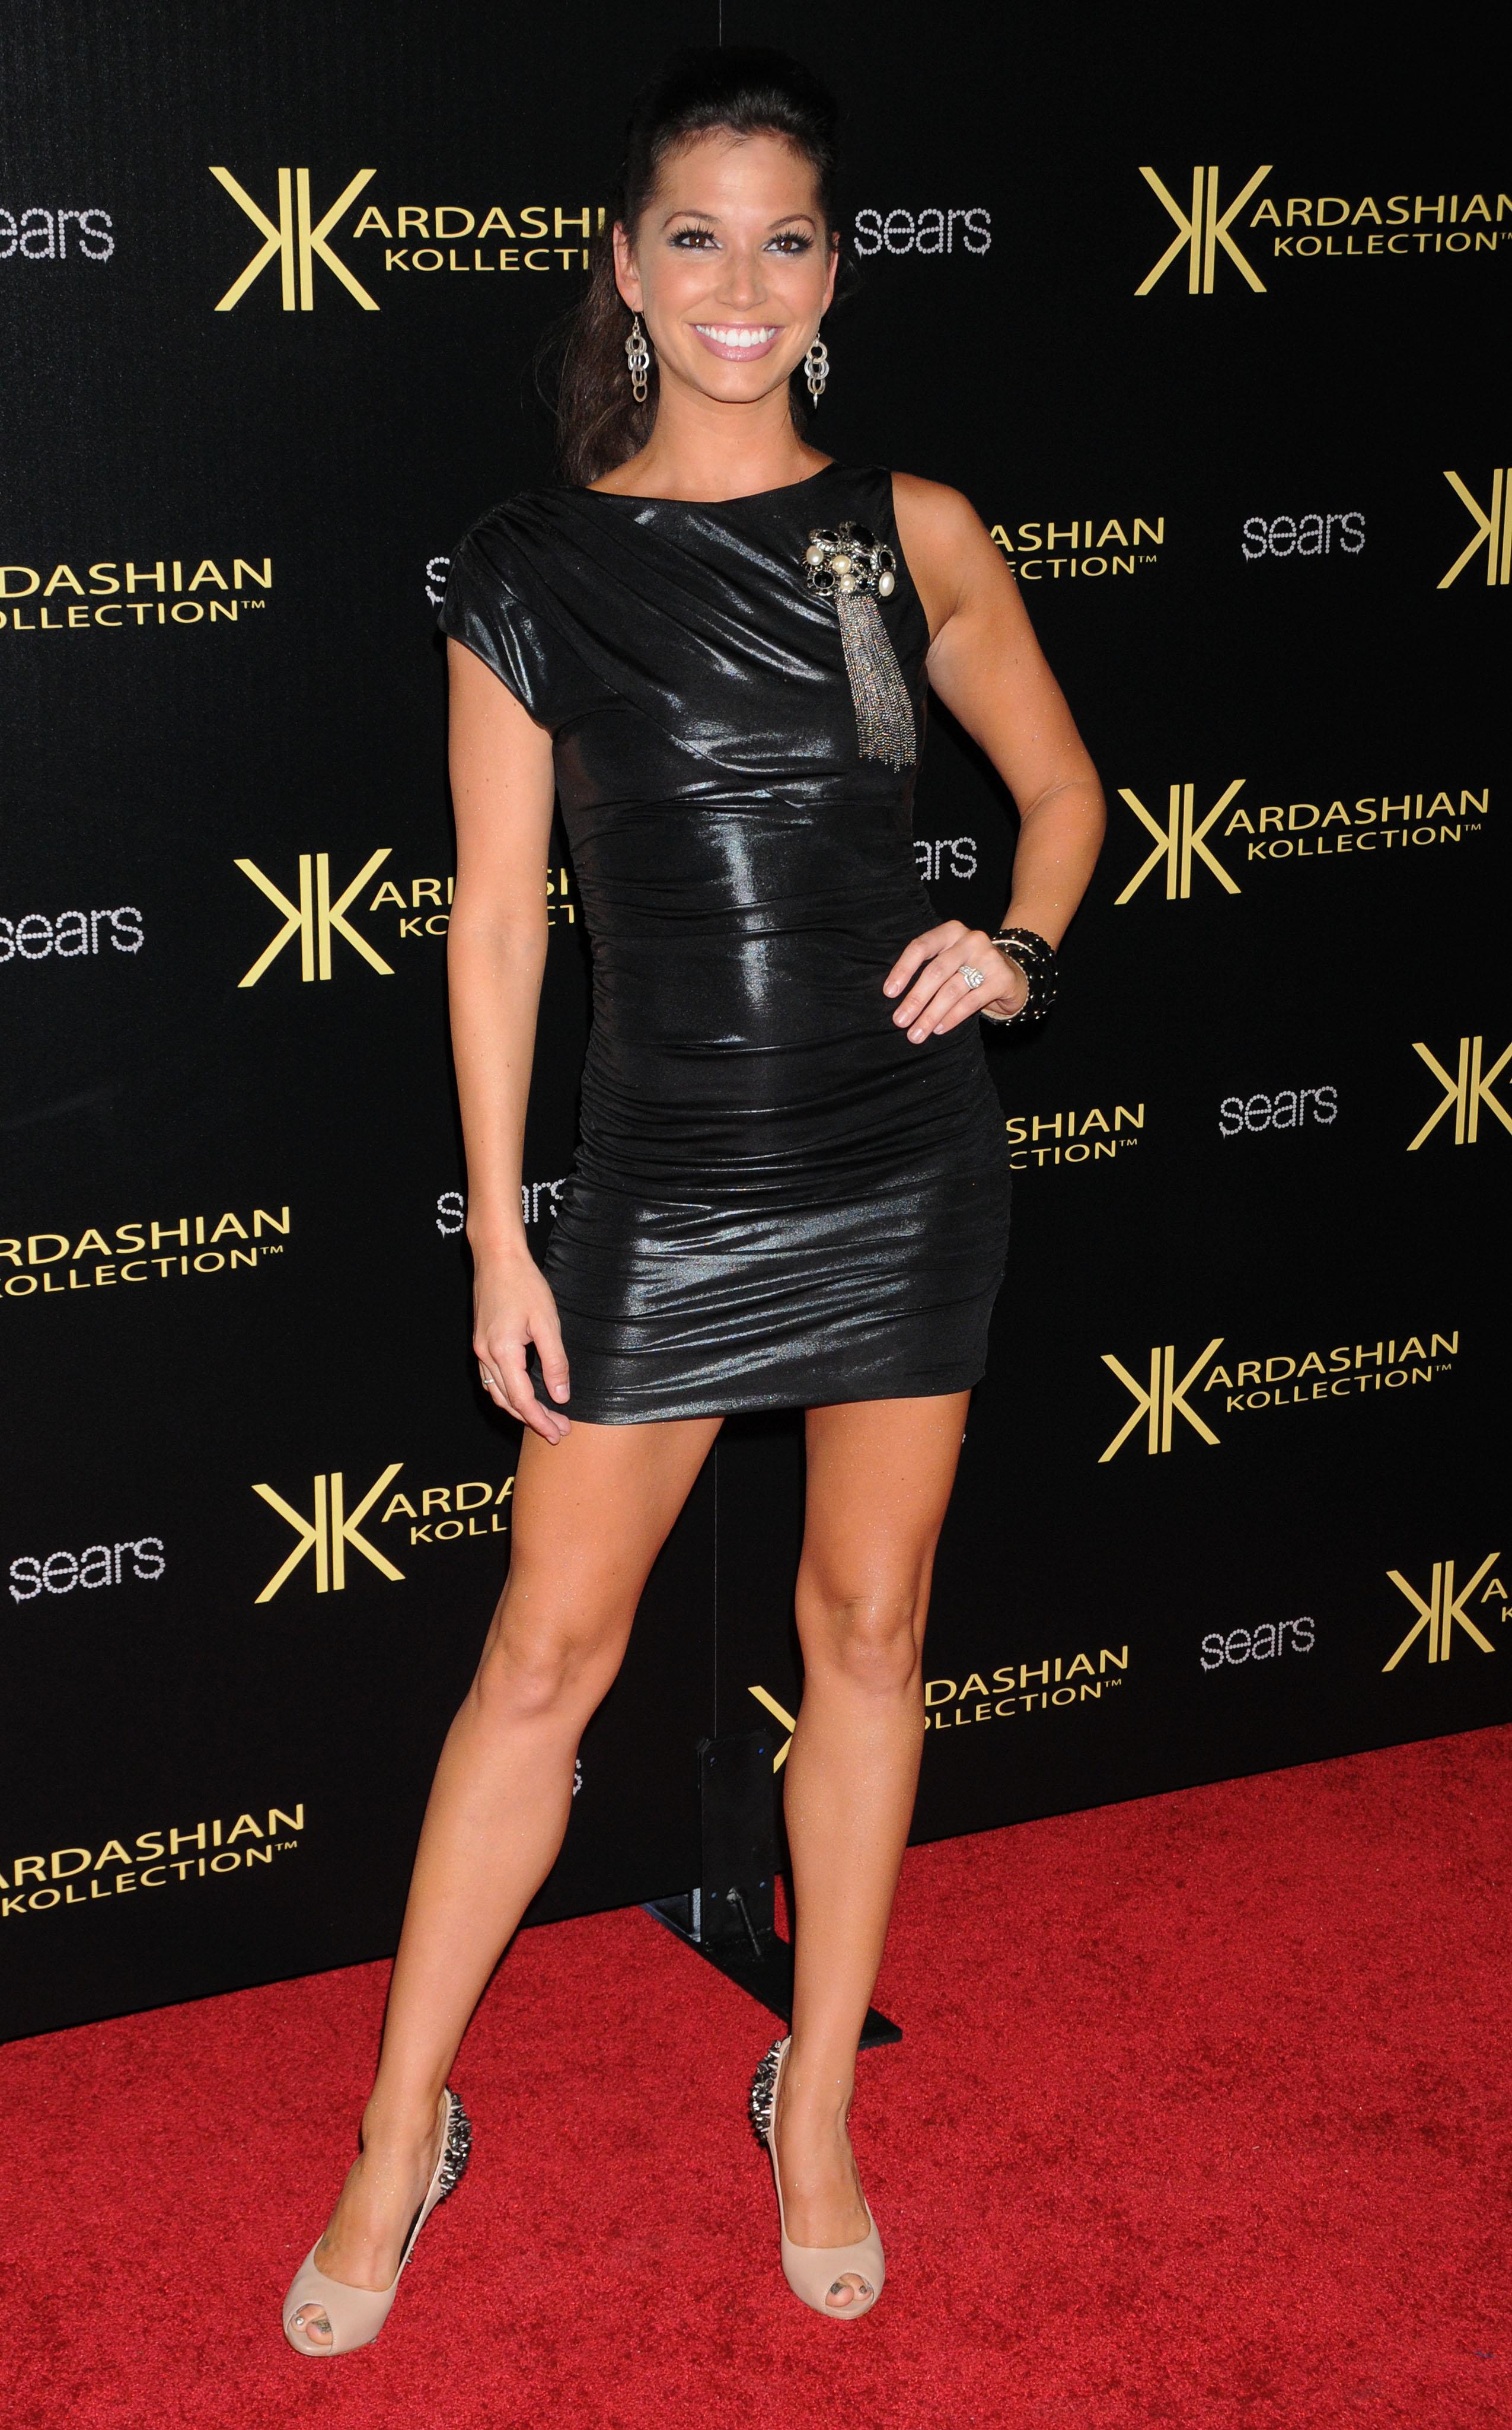 Melissa Rycroft In Tight Black Dress 05 Gotceleb